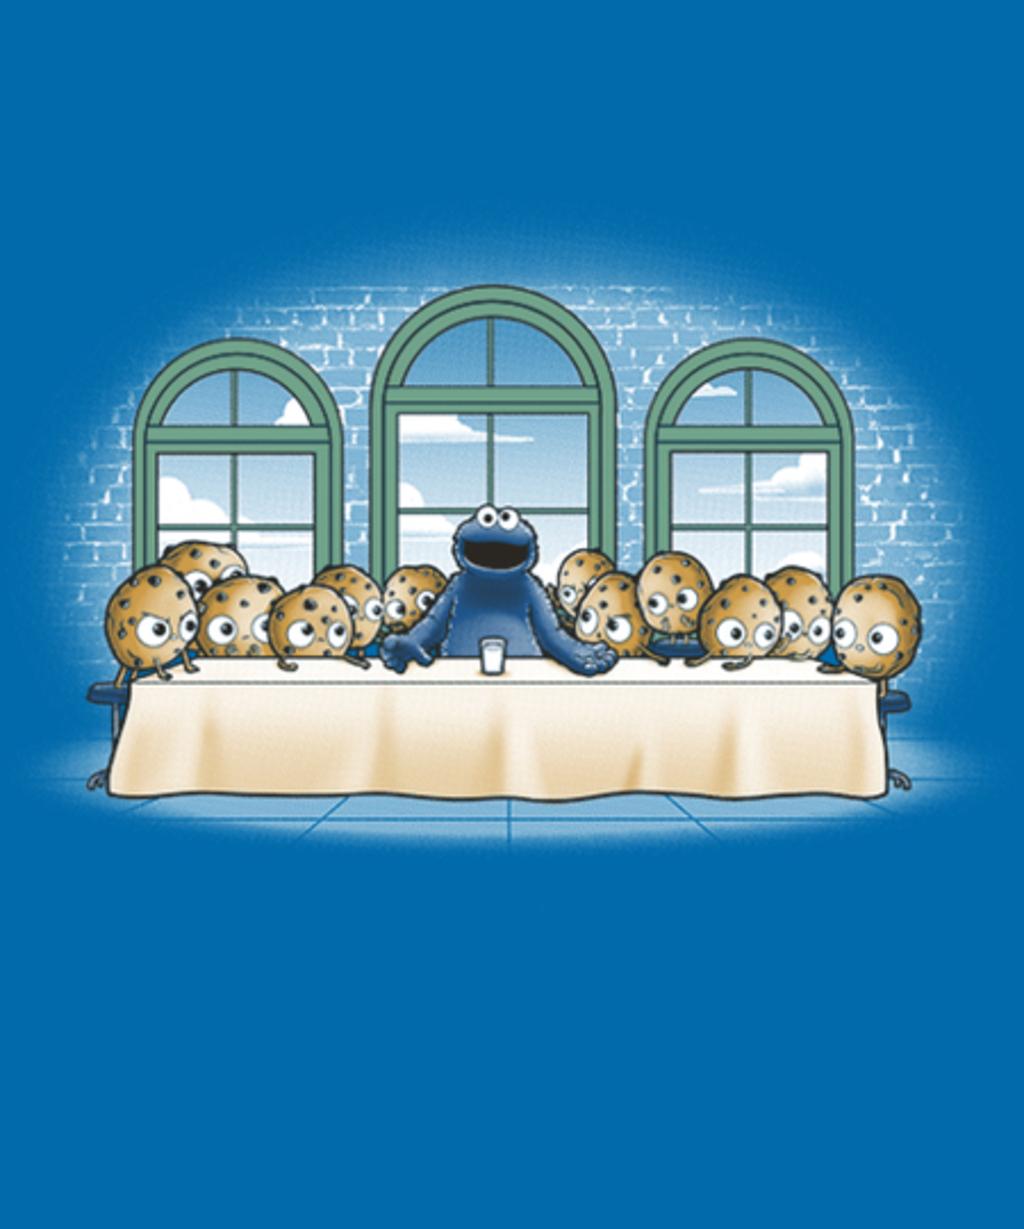 Qwertee: Cookies dinner